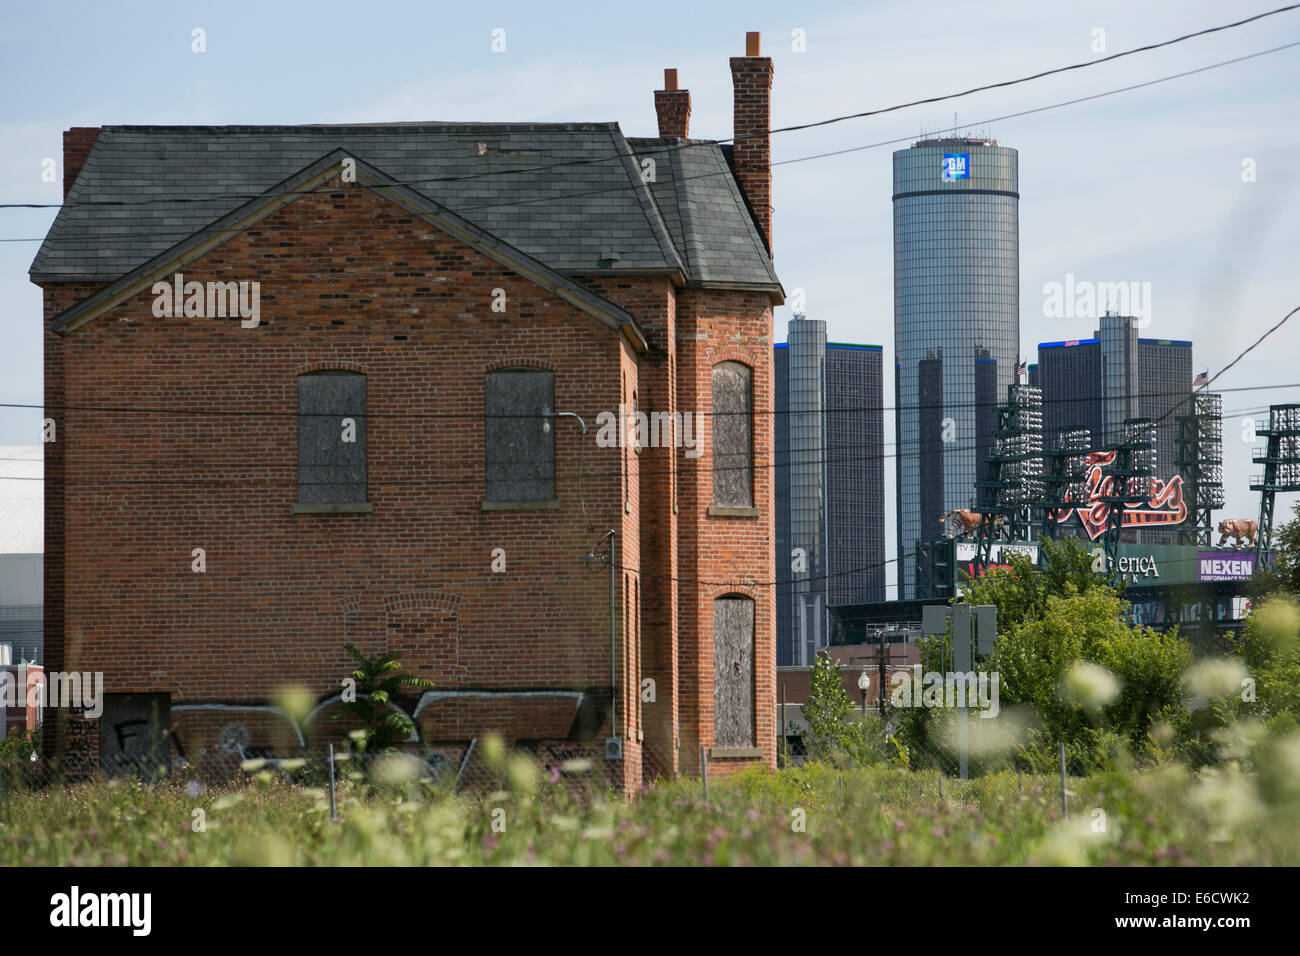 The Renaissance Center, headquarters of General Motors (GM) in Detroit, Michigan. - Stock Image